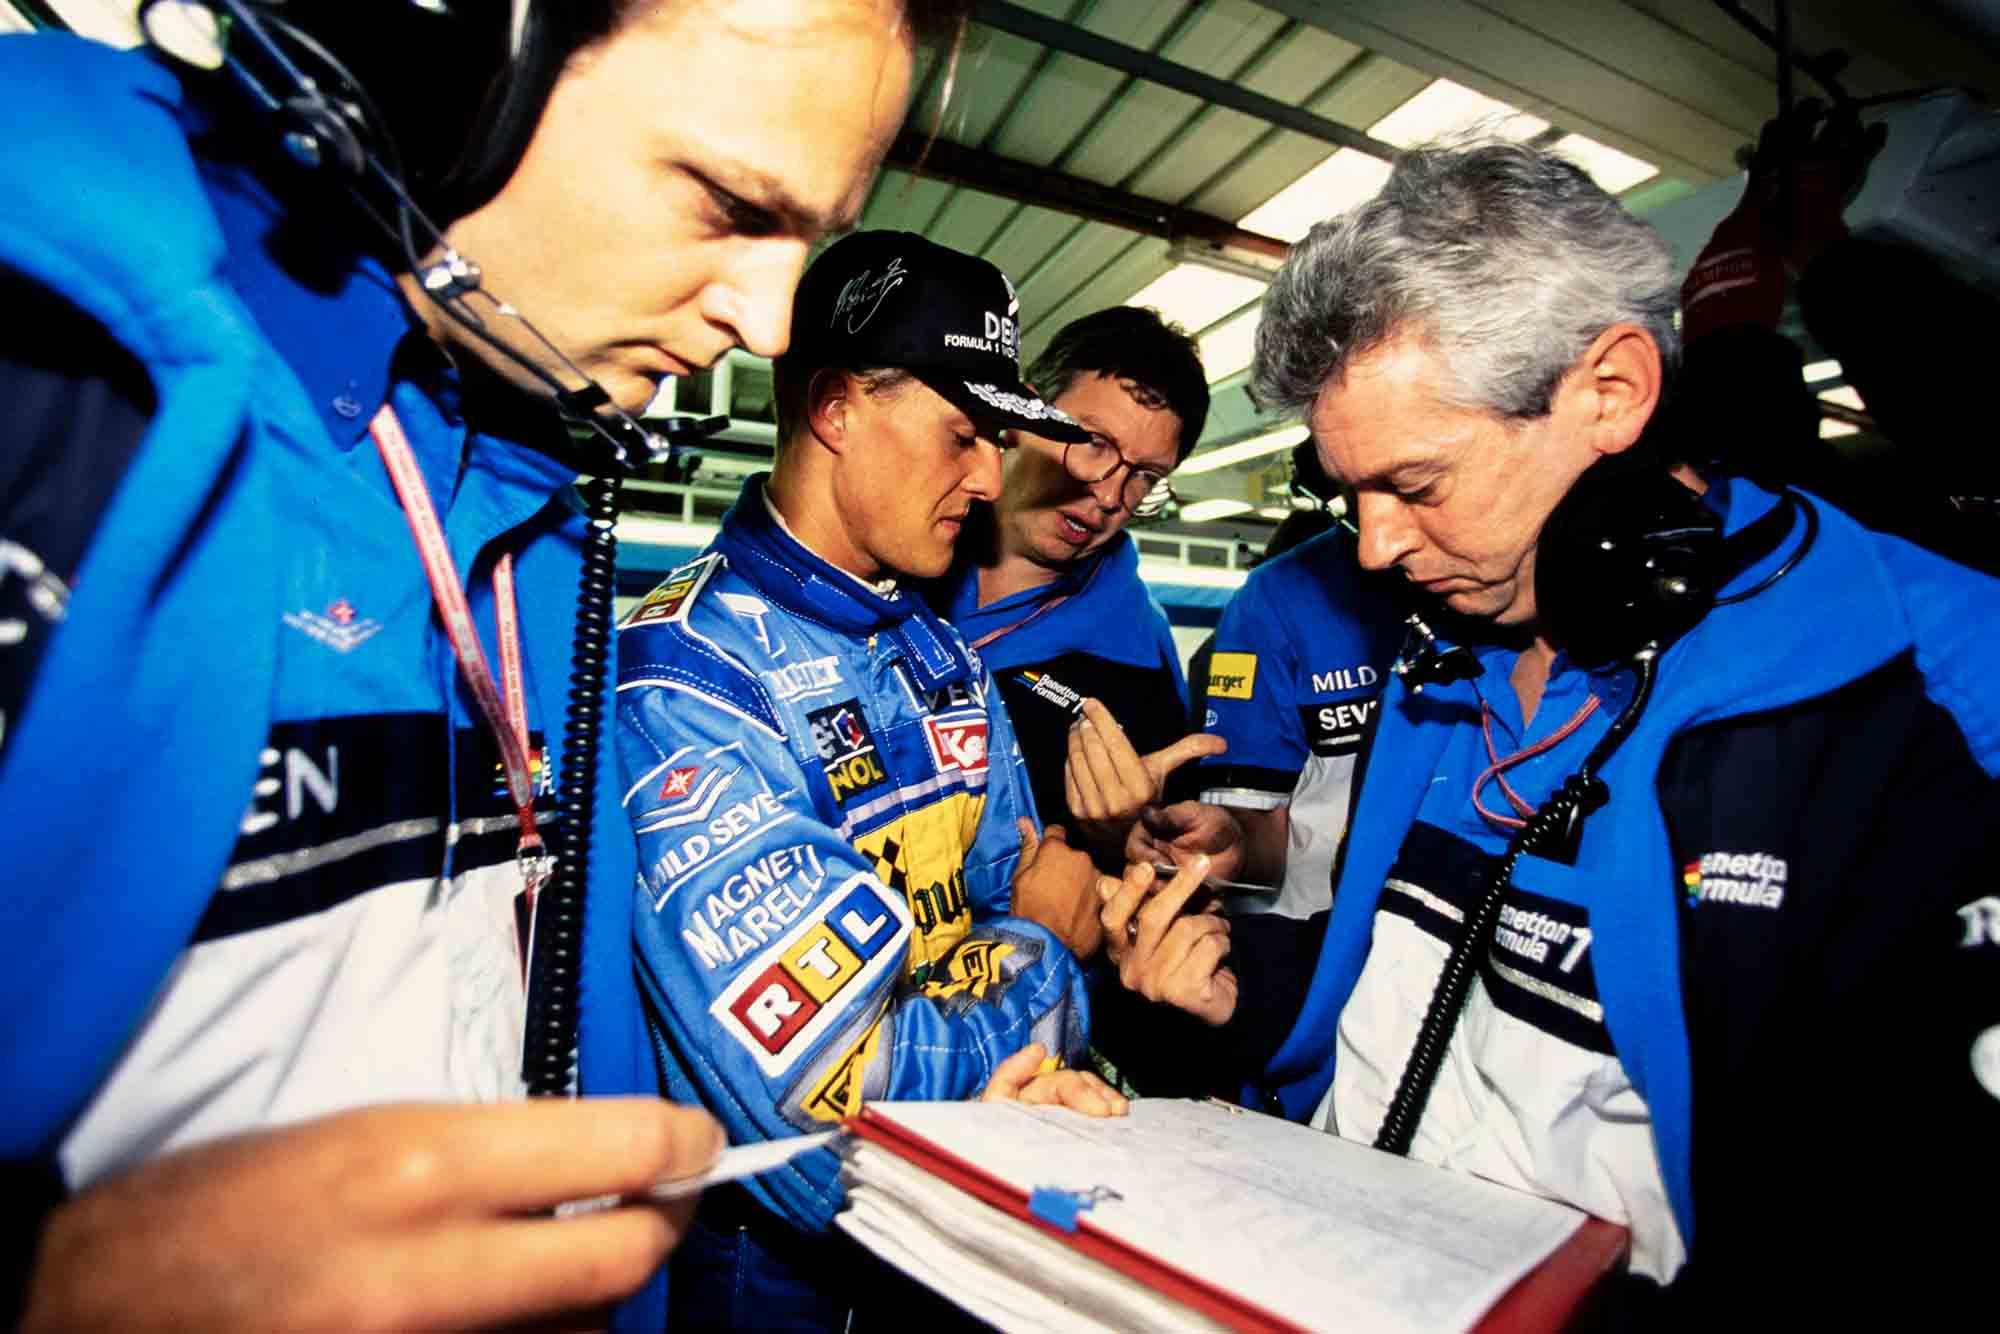 Michael Schumacher, Ross Brawn, Pat Symonds in the Benetton